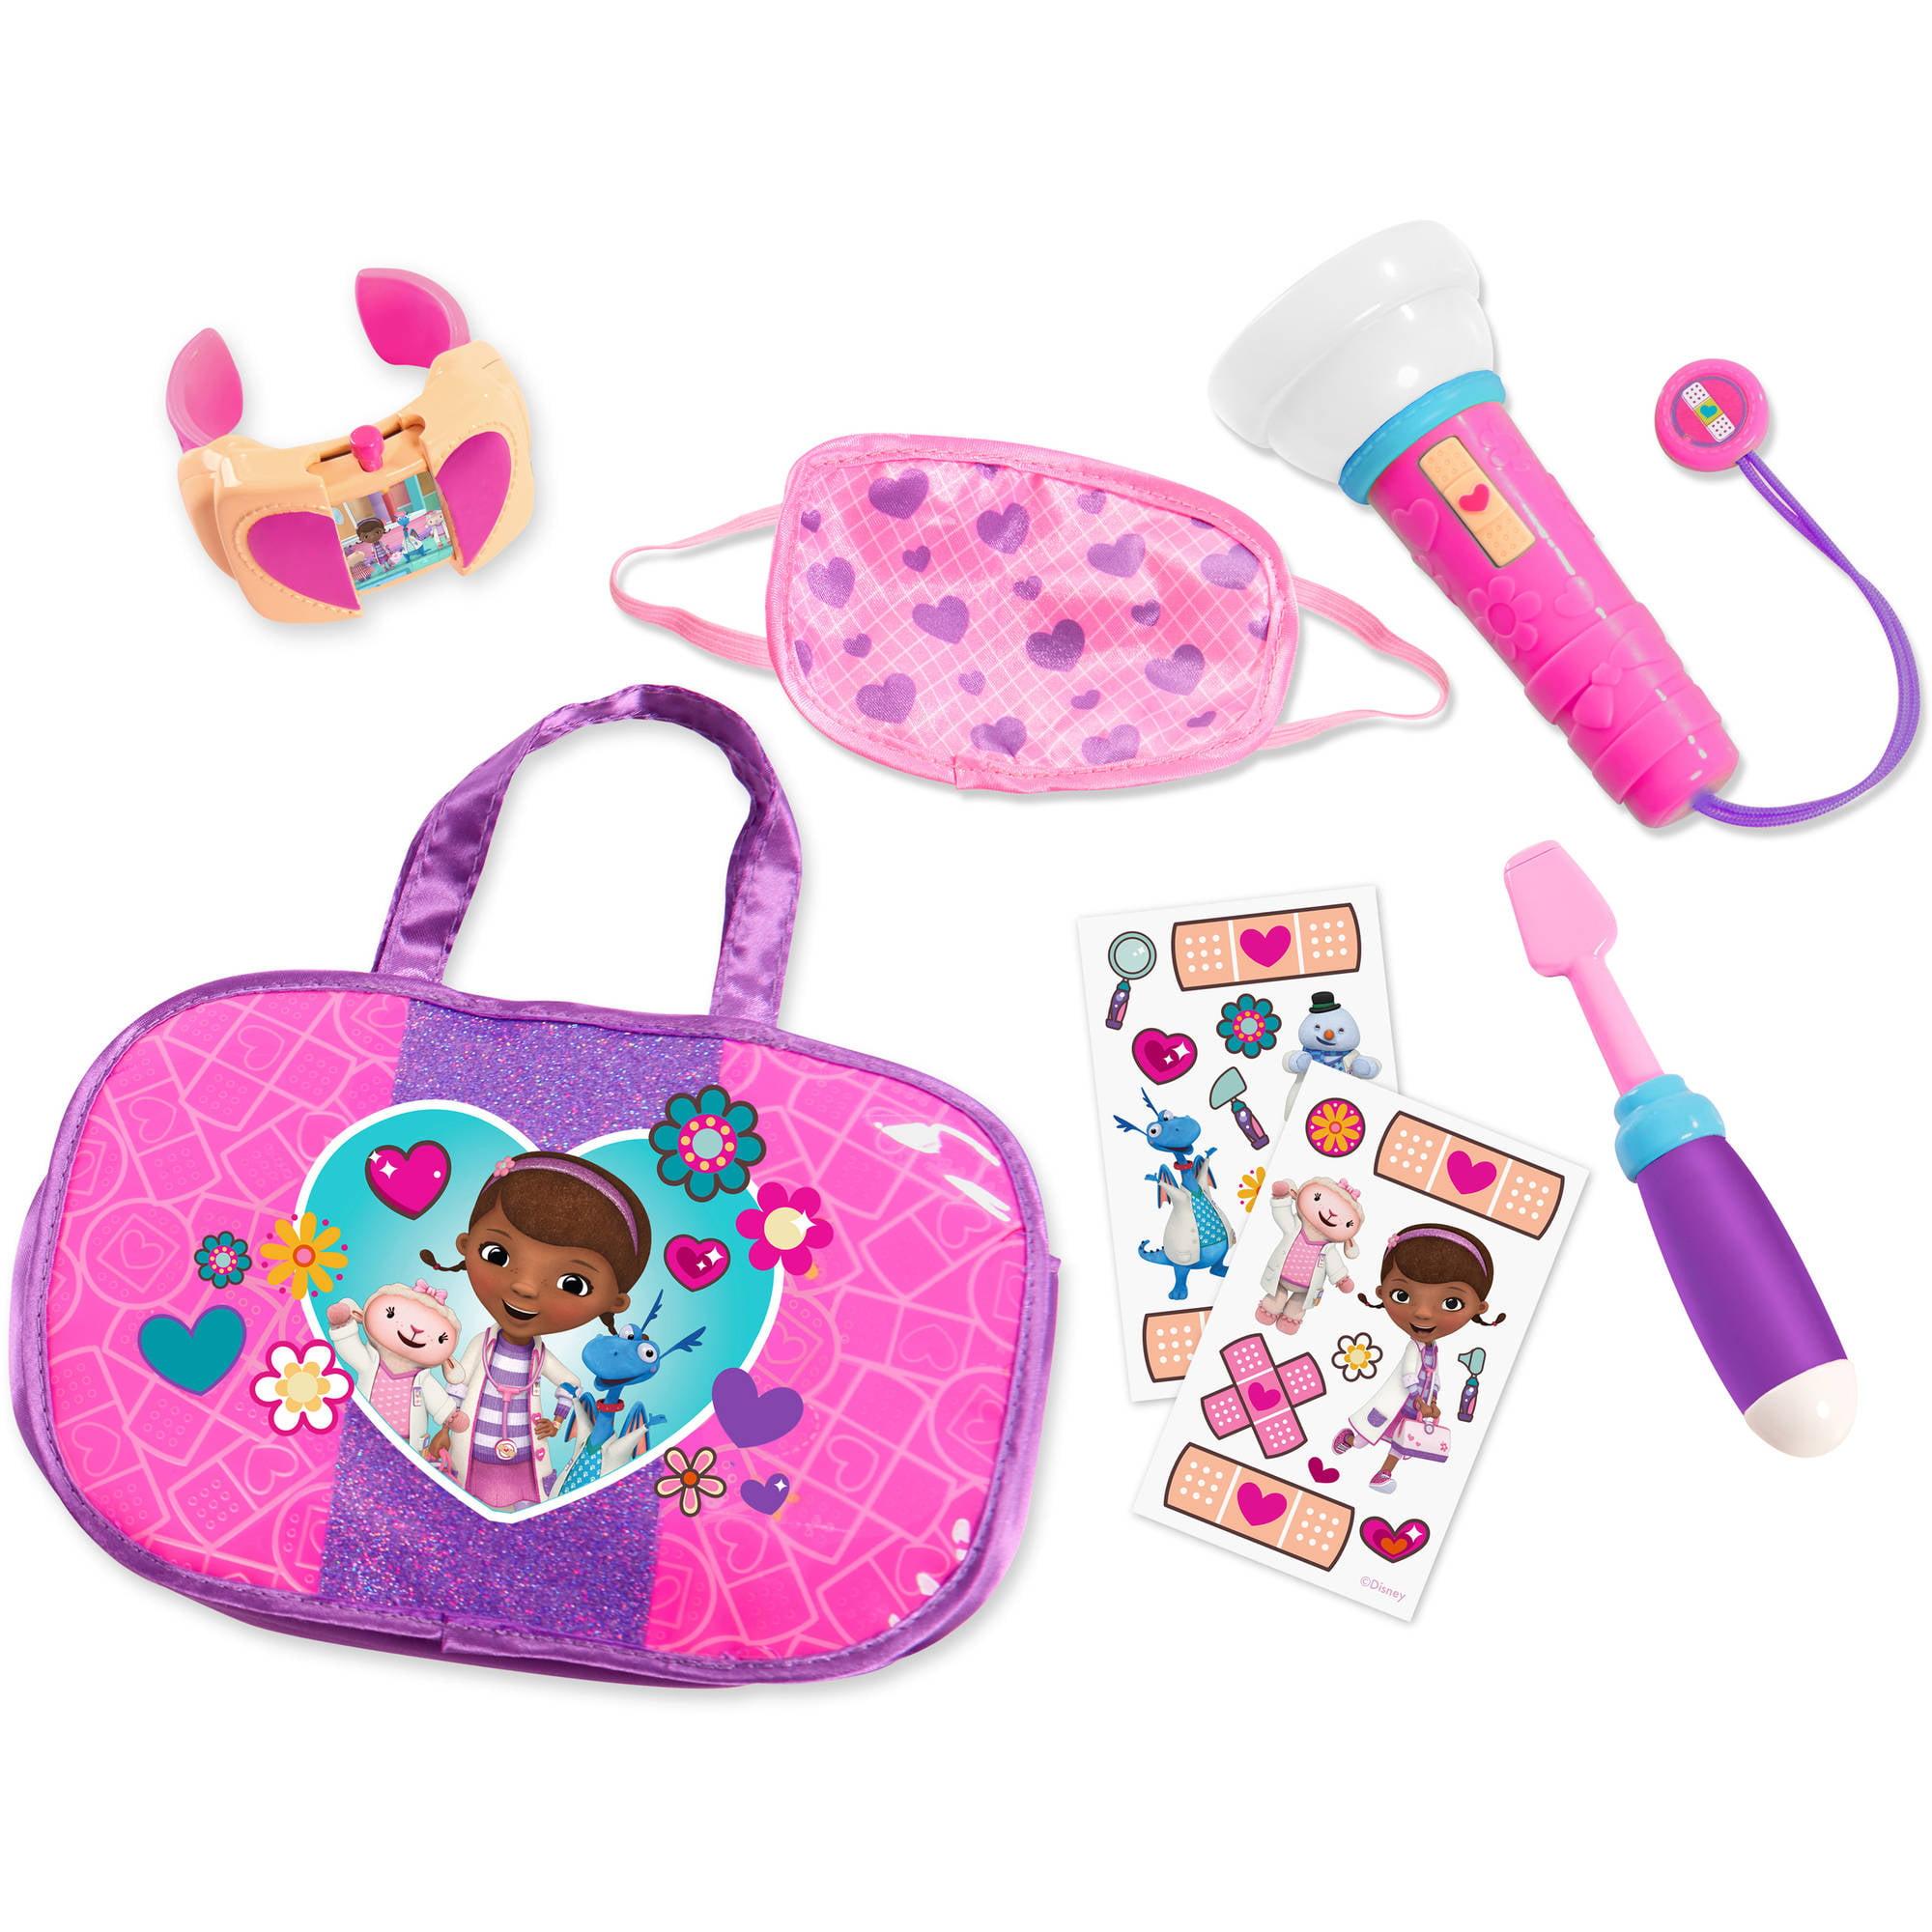 Doc Mcstuffins Toys : Doc mcstuffins bathroom set my web value